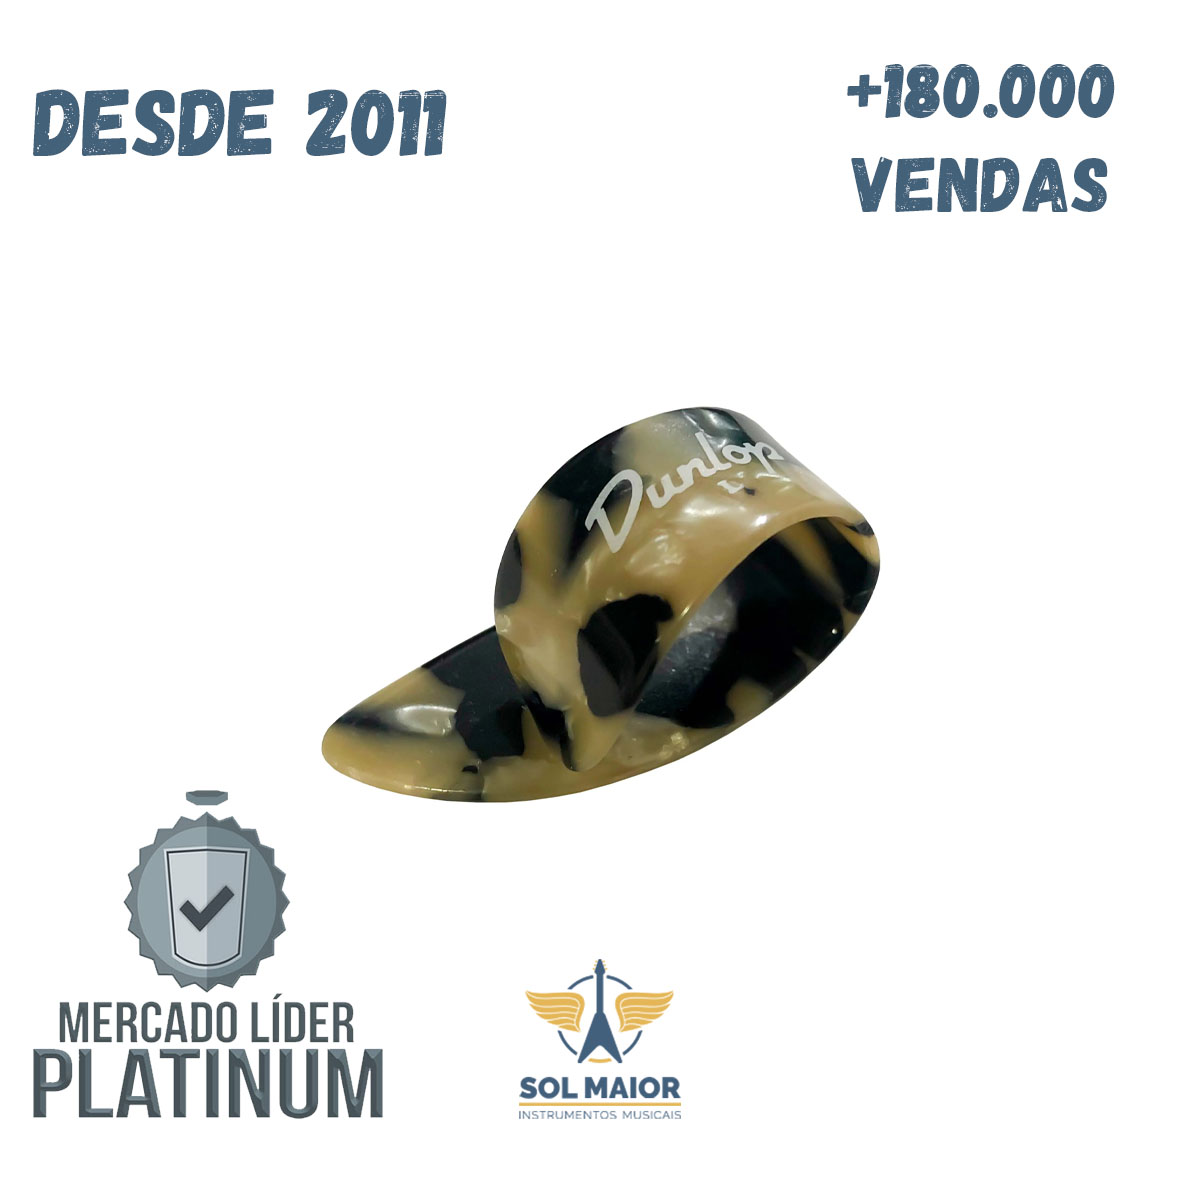 Kit Dedeira Dedal Calico Gd Pct C/02 Dunlop Viola